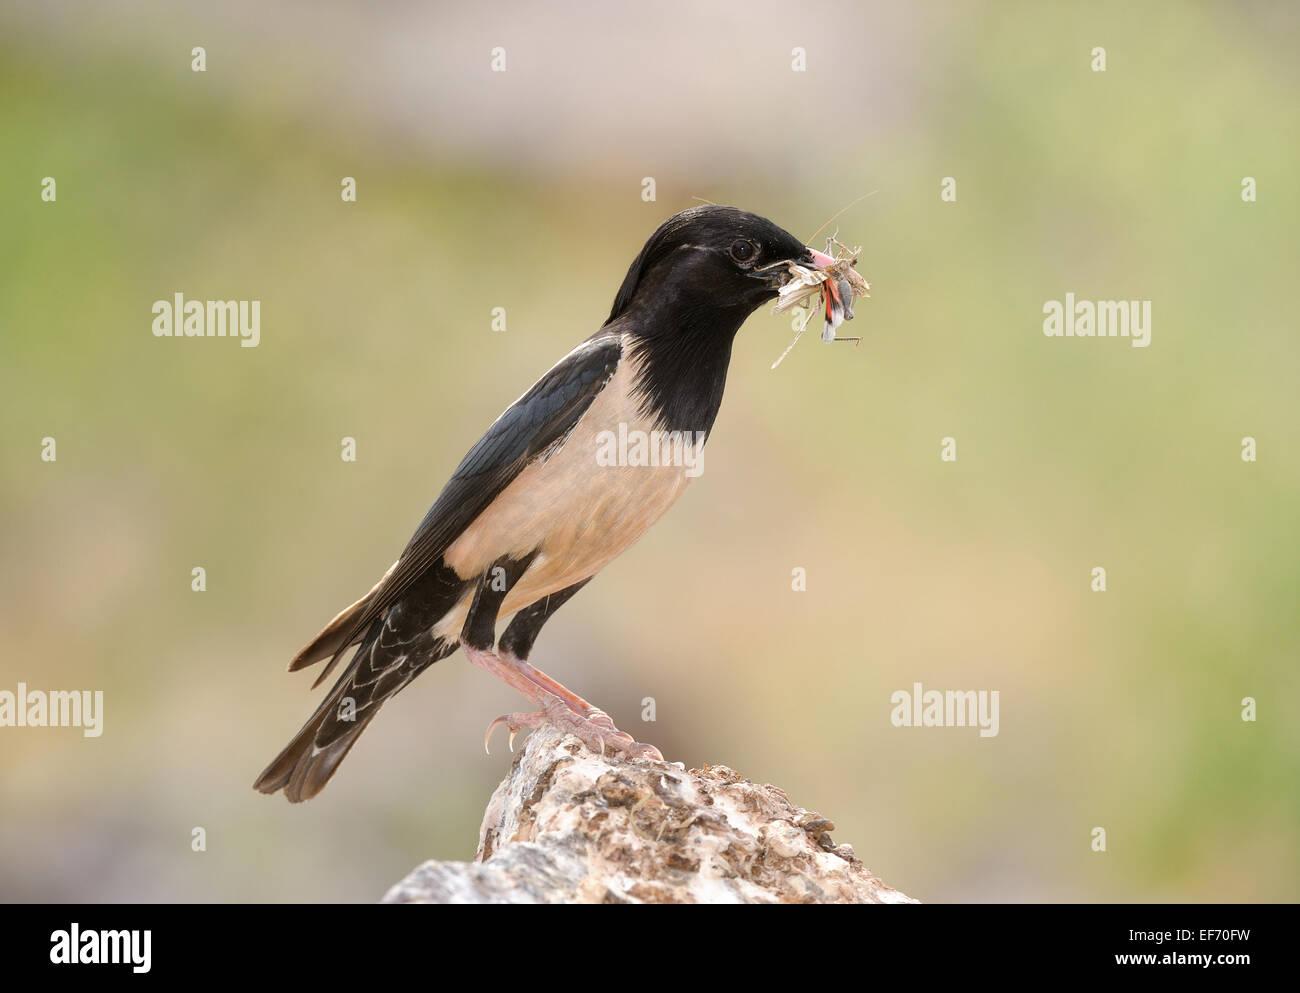 Rosig Pastor in Sorbulak See, Südkasachstan, Vogel mit Beute Stockbild